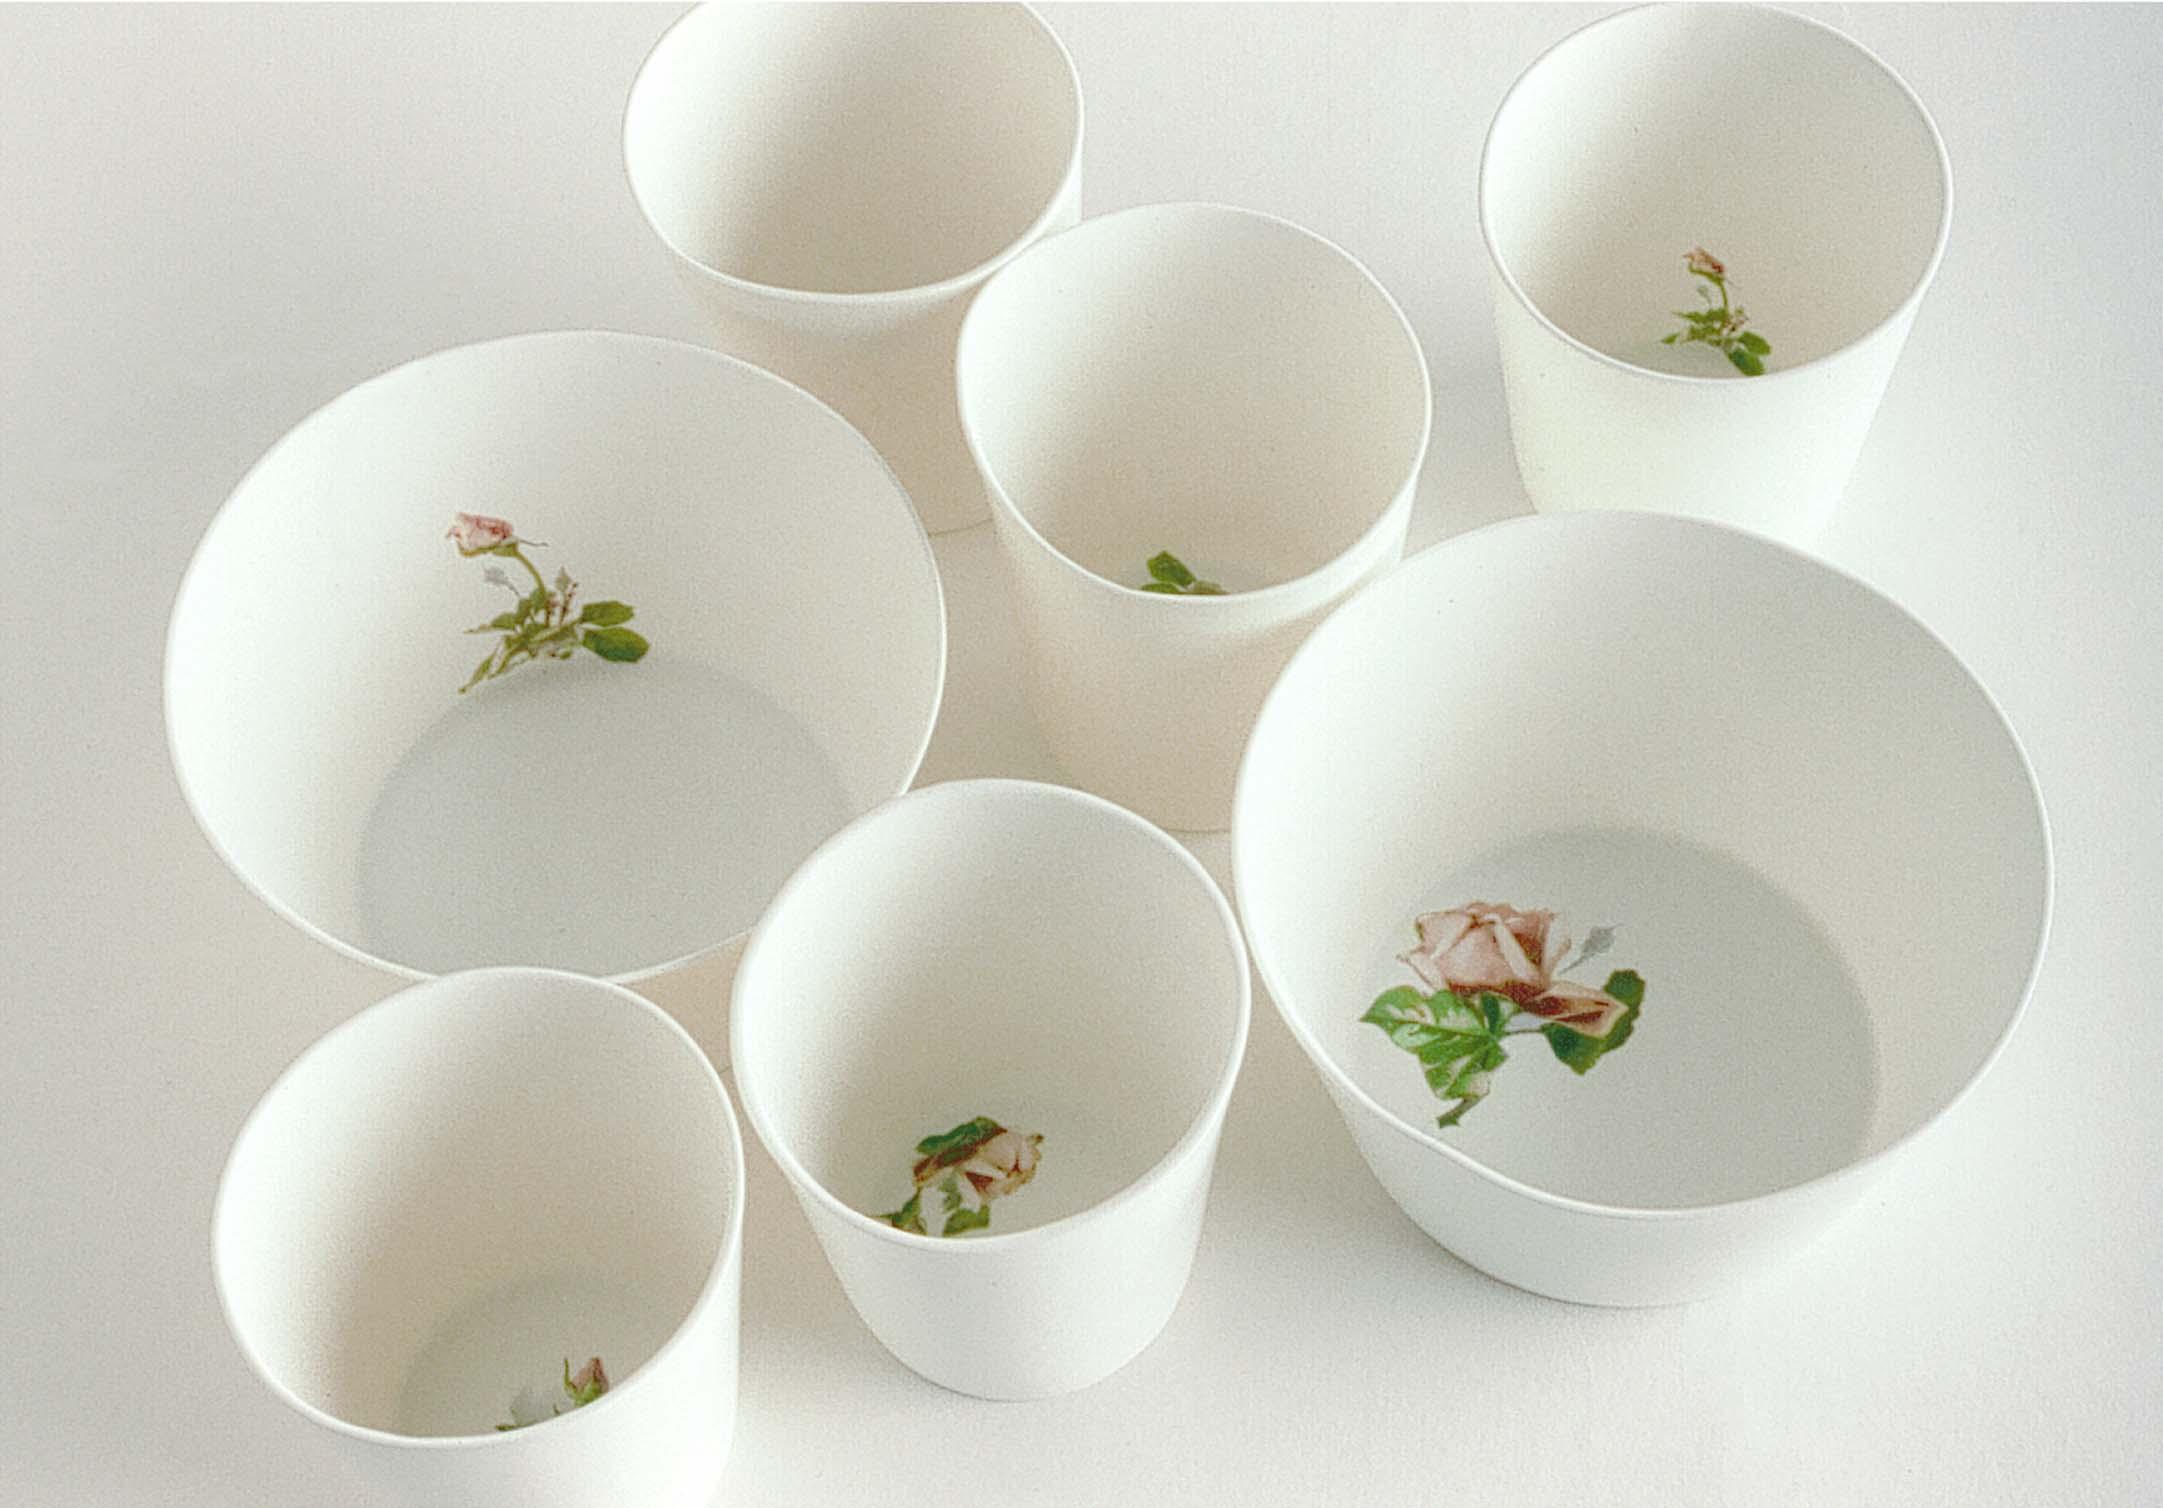 porcelaine_les objets roses_Lucile Soufflet_3